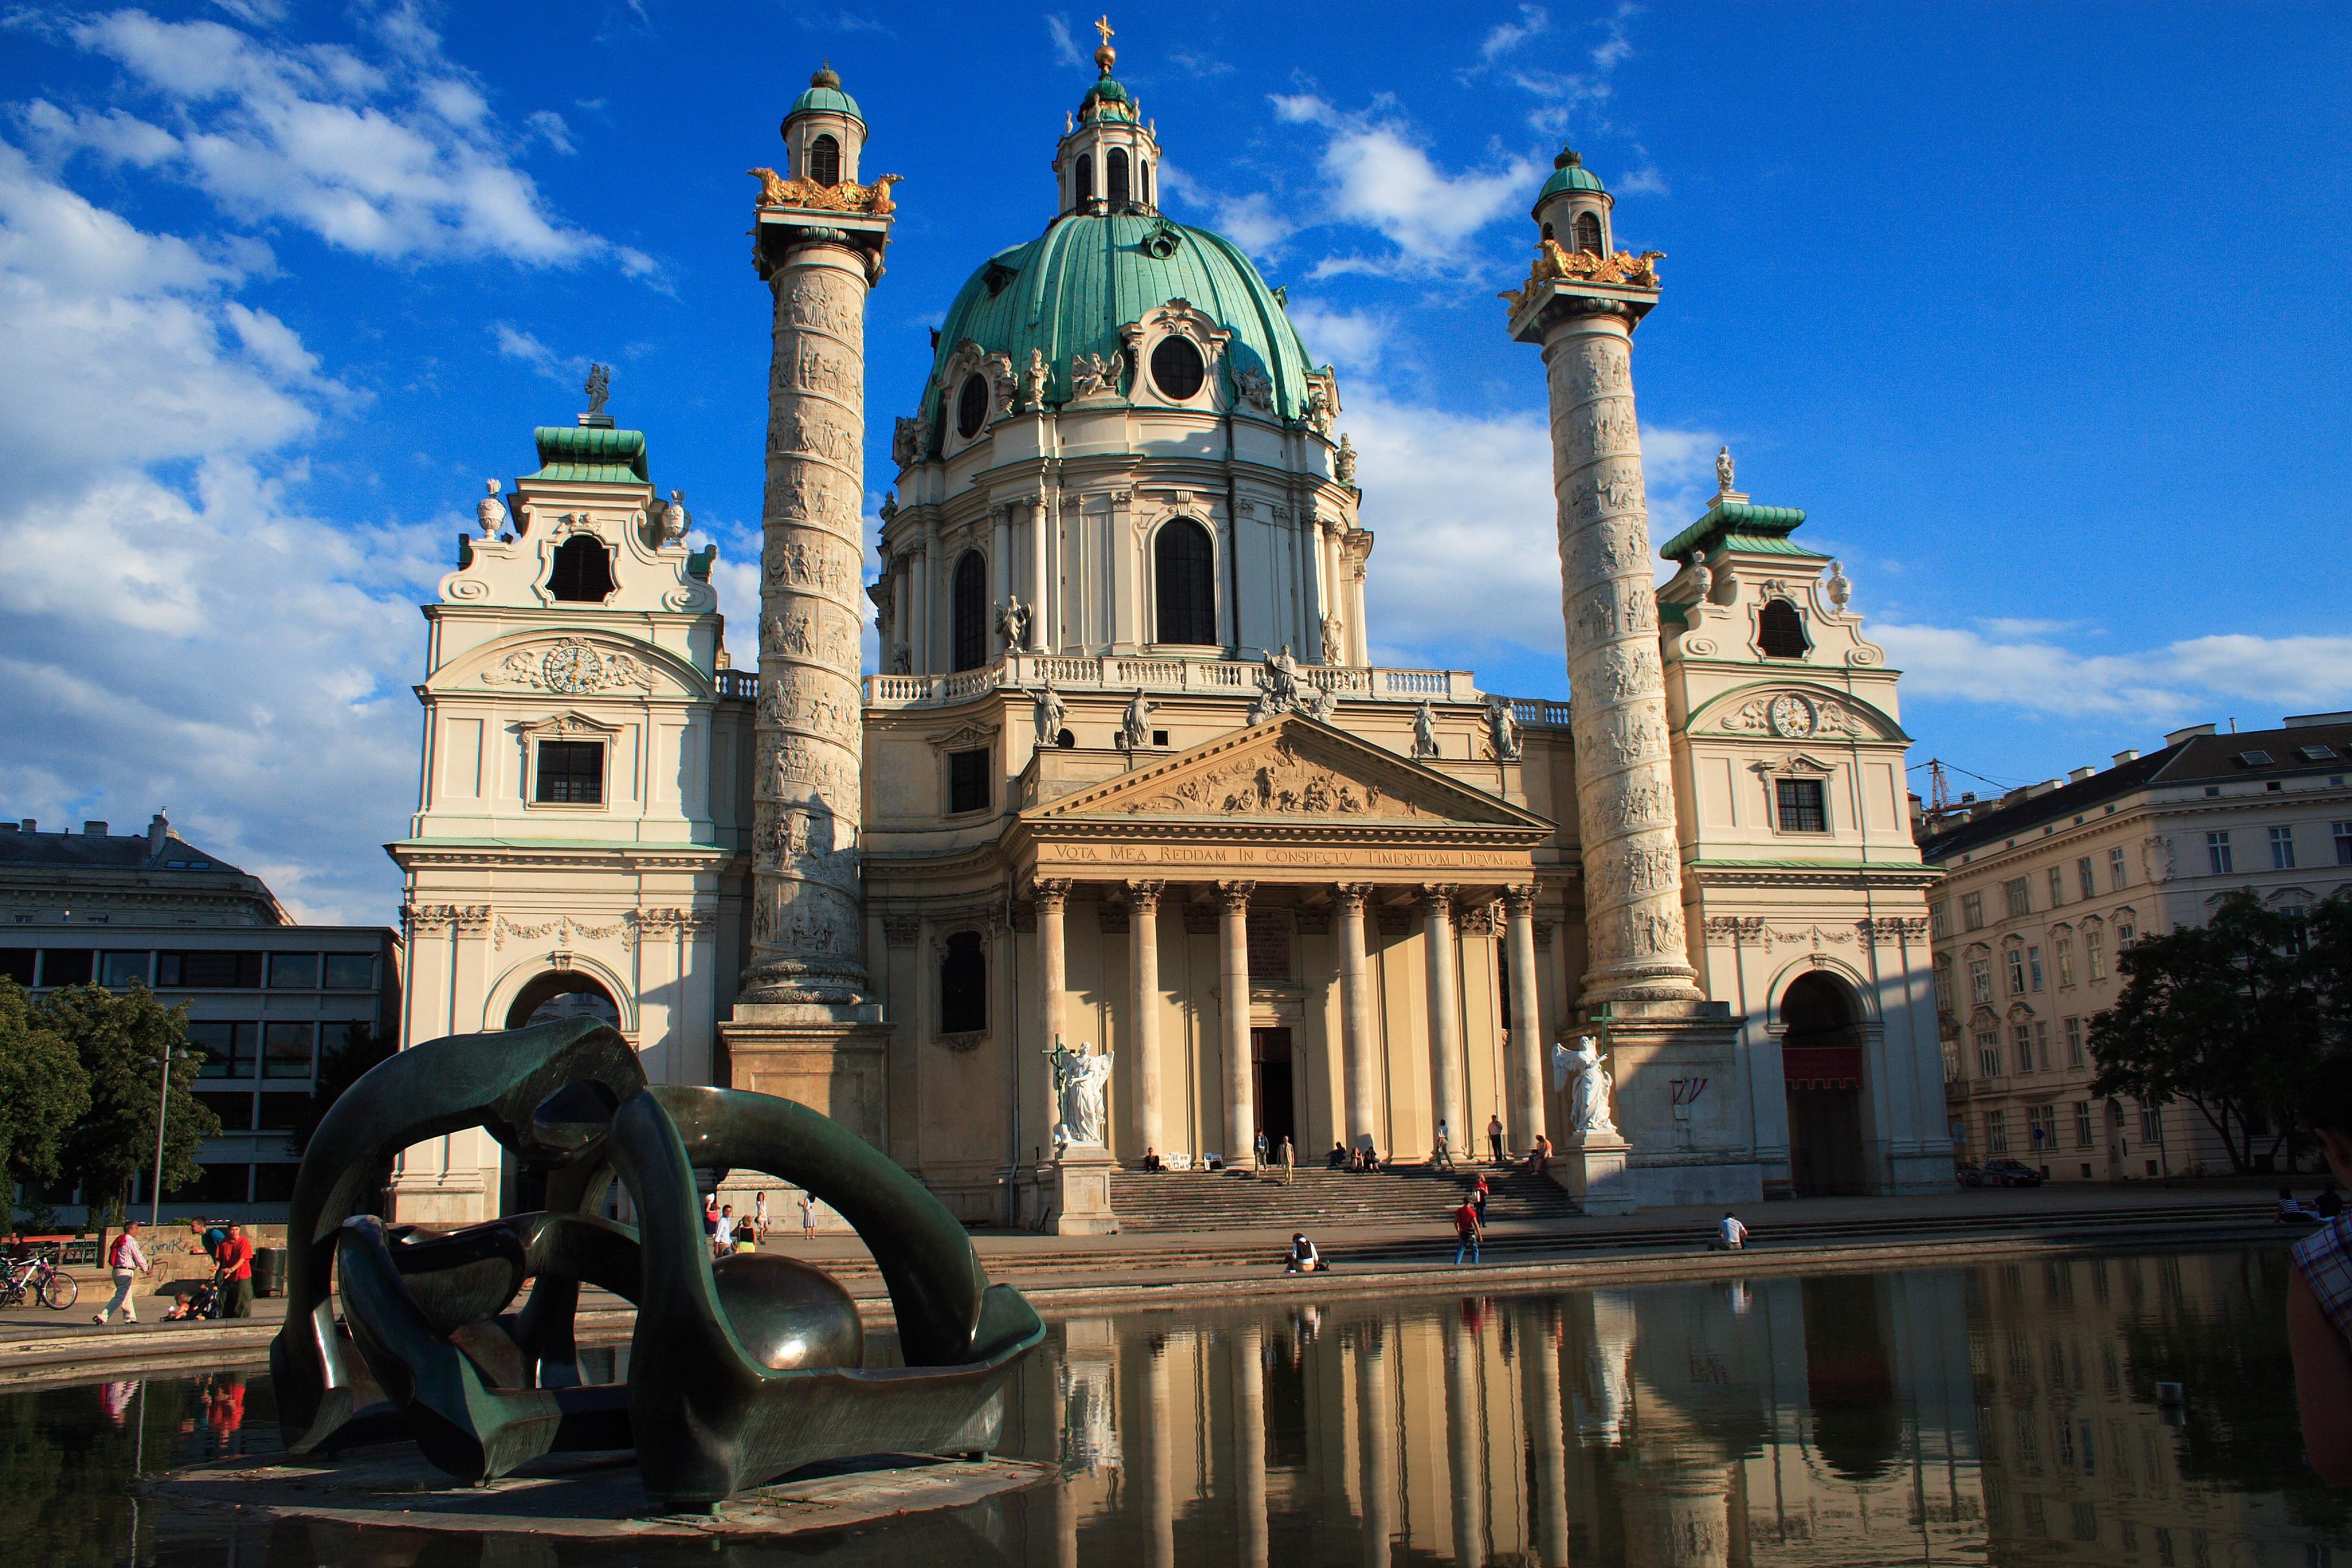 http://upload.wikimedia.org/wikipedia/commons/7/7b/Karlskirche,_Vienna.jpg